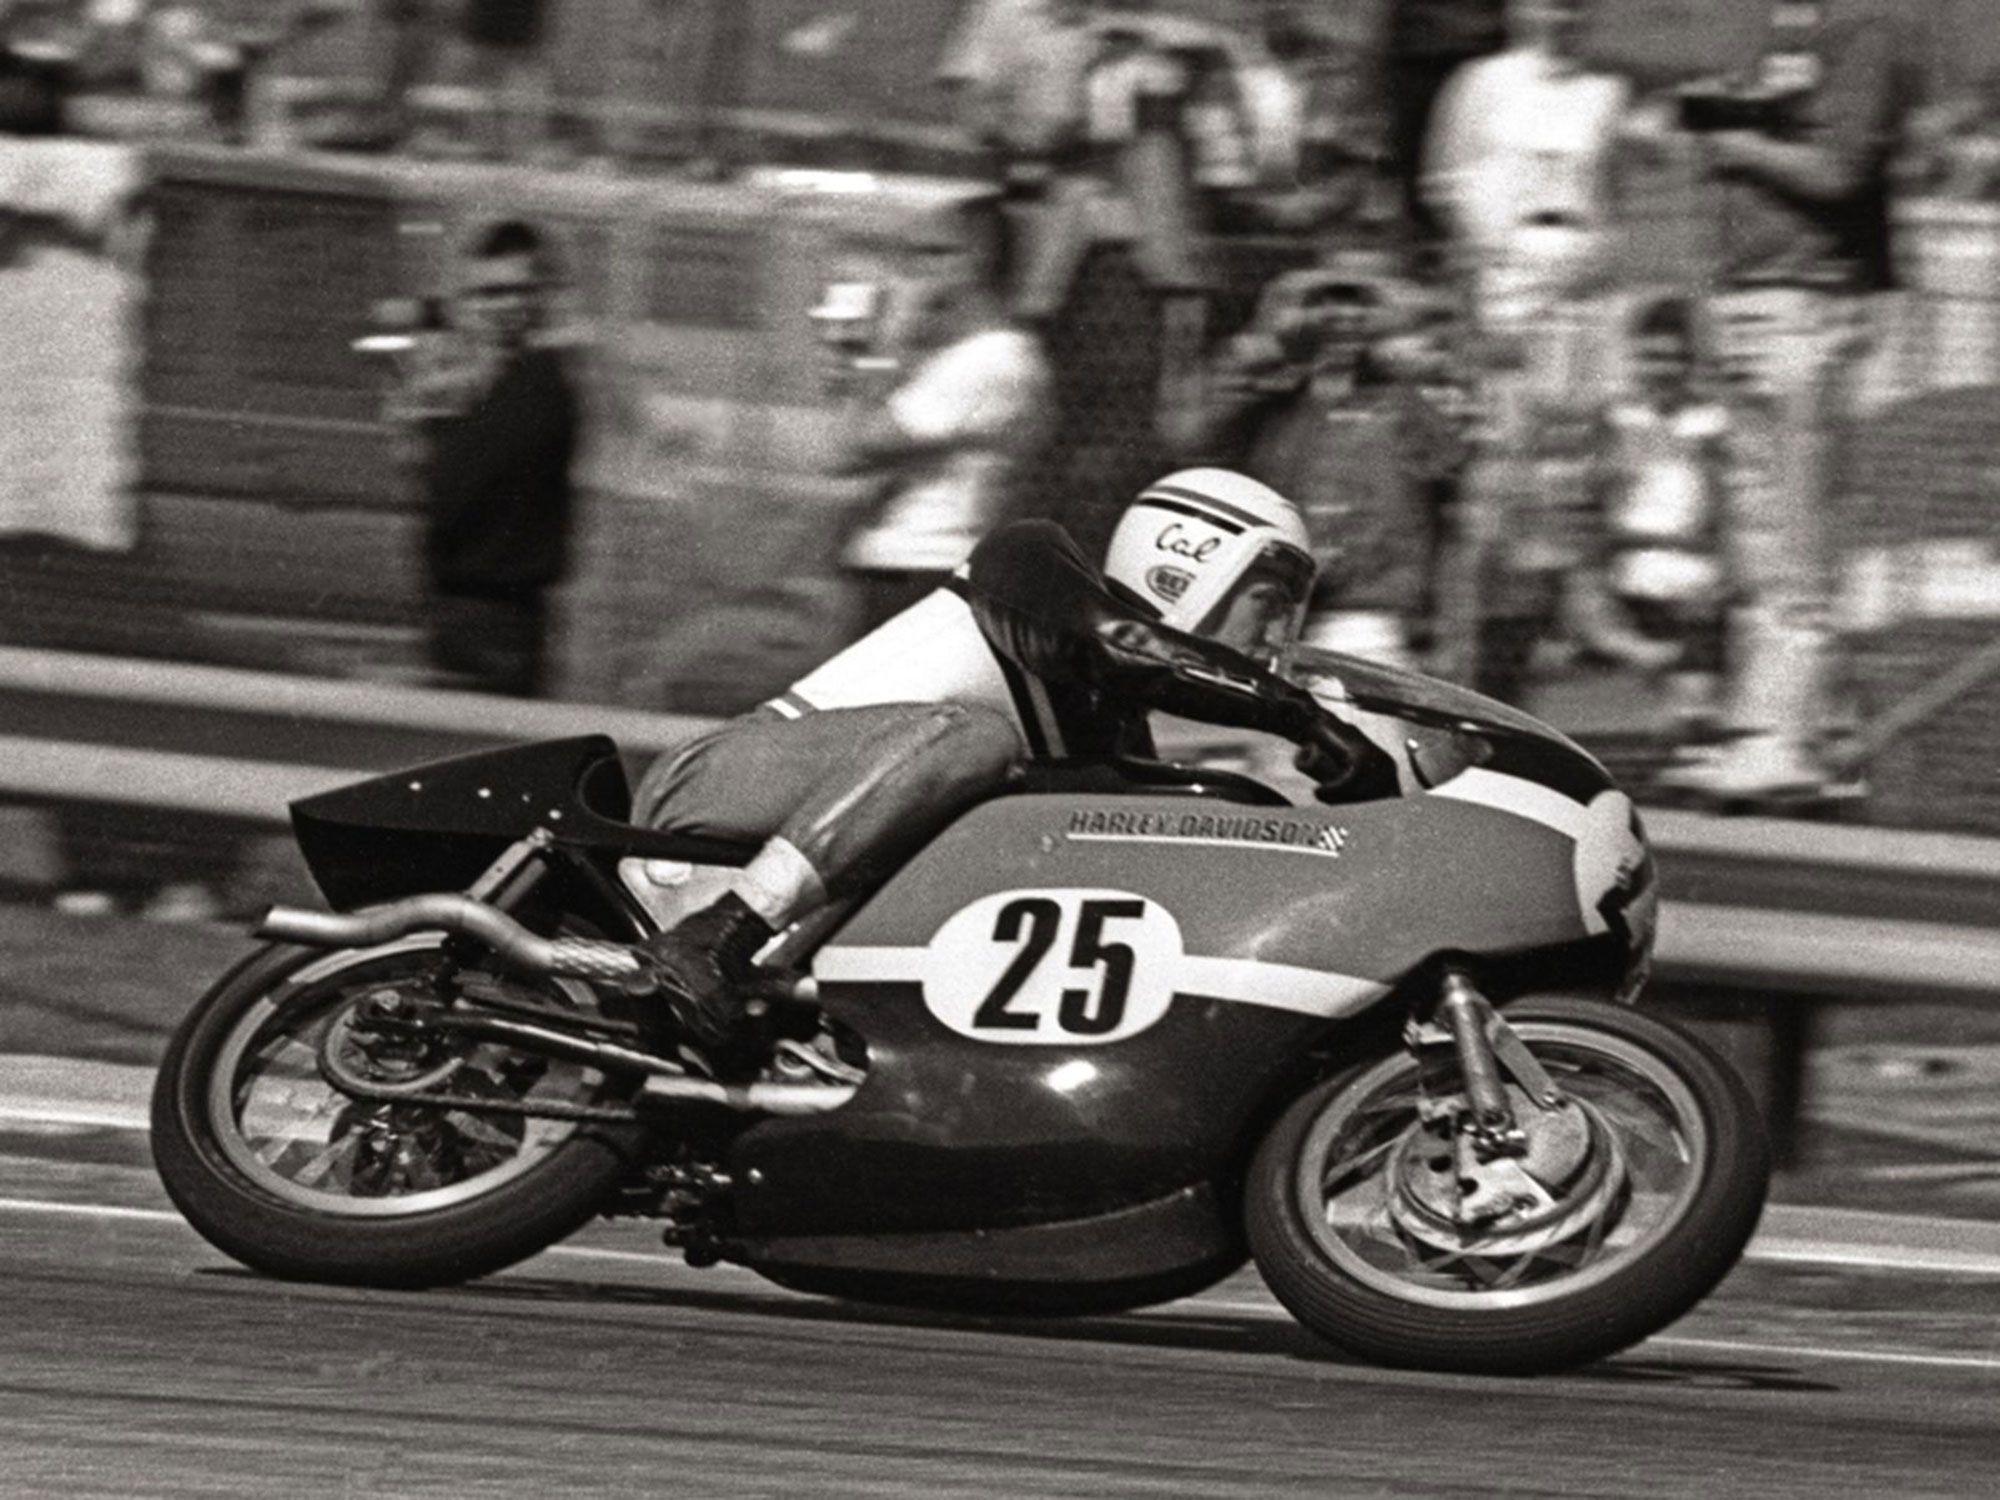 Cal Rayborn took the 1968 Daytona 200 on a flathead Harley-Davidson KR.